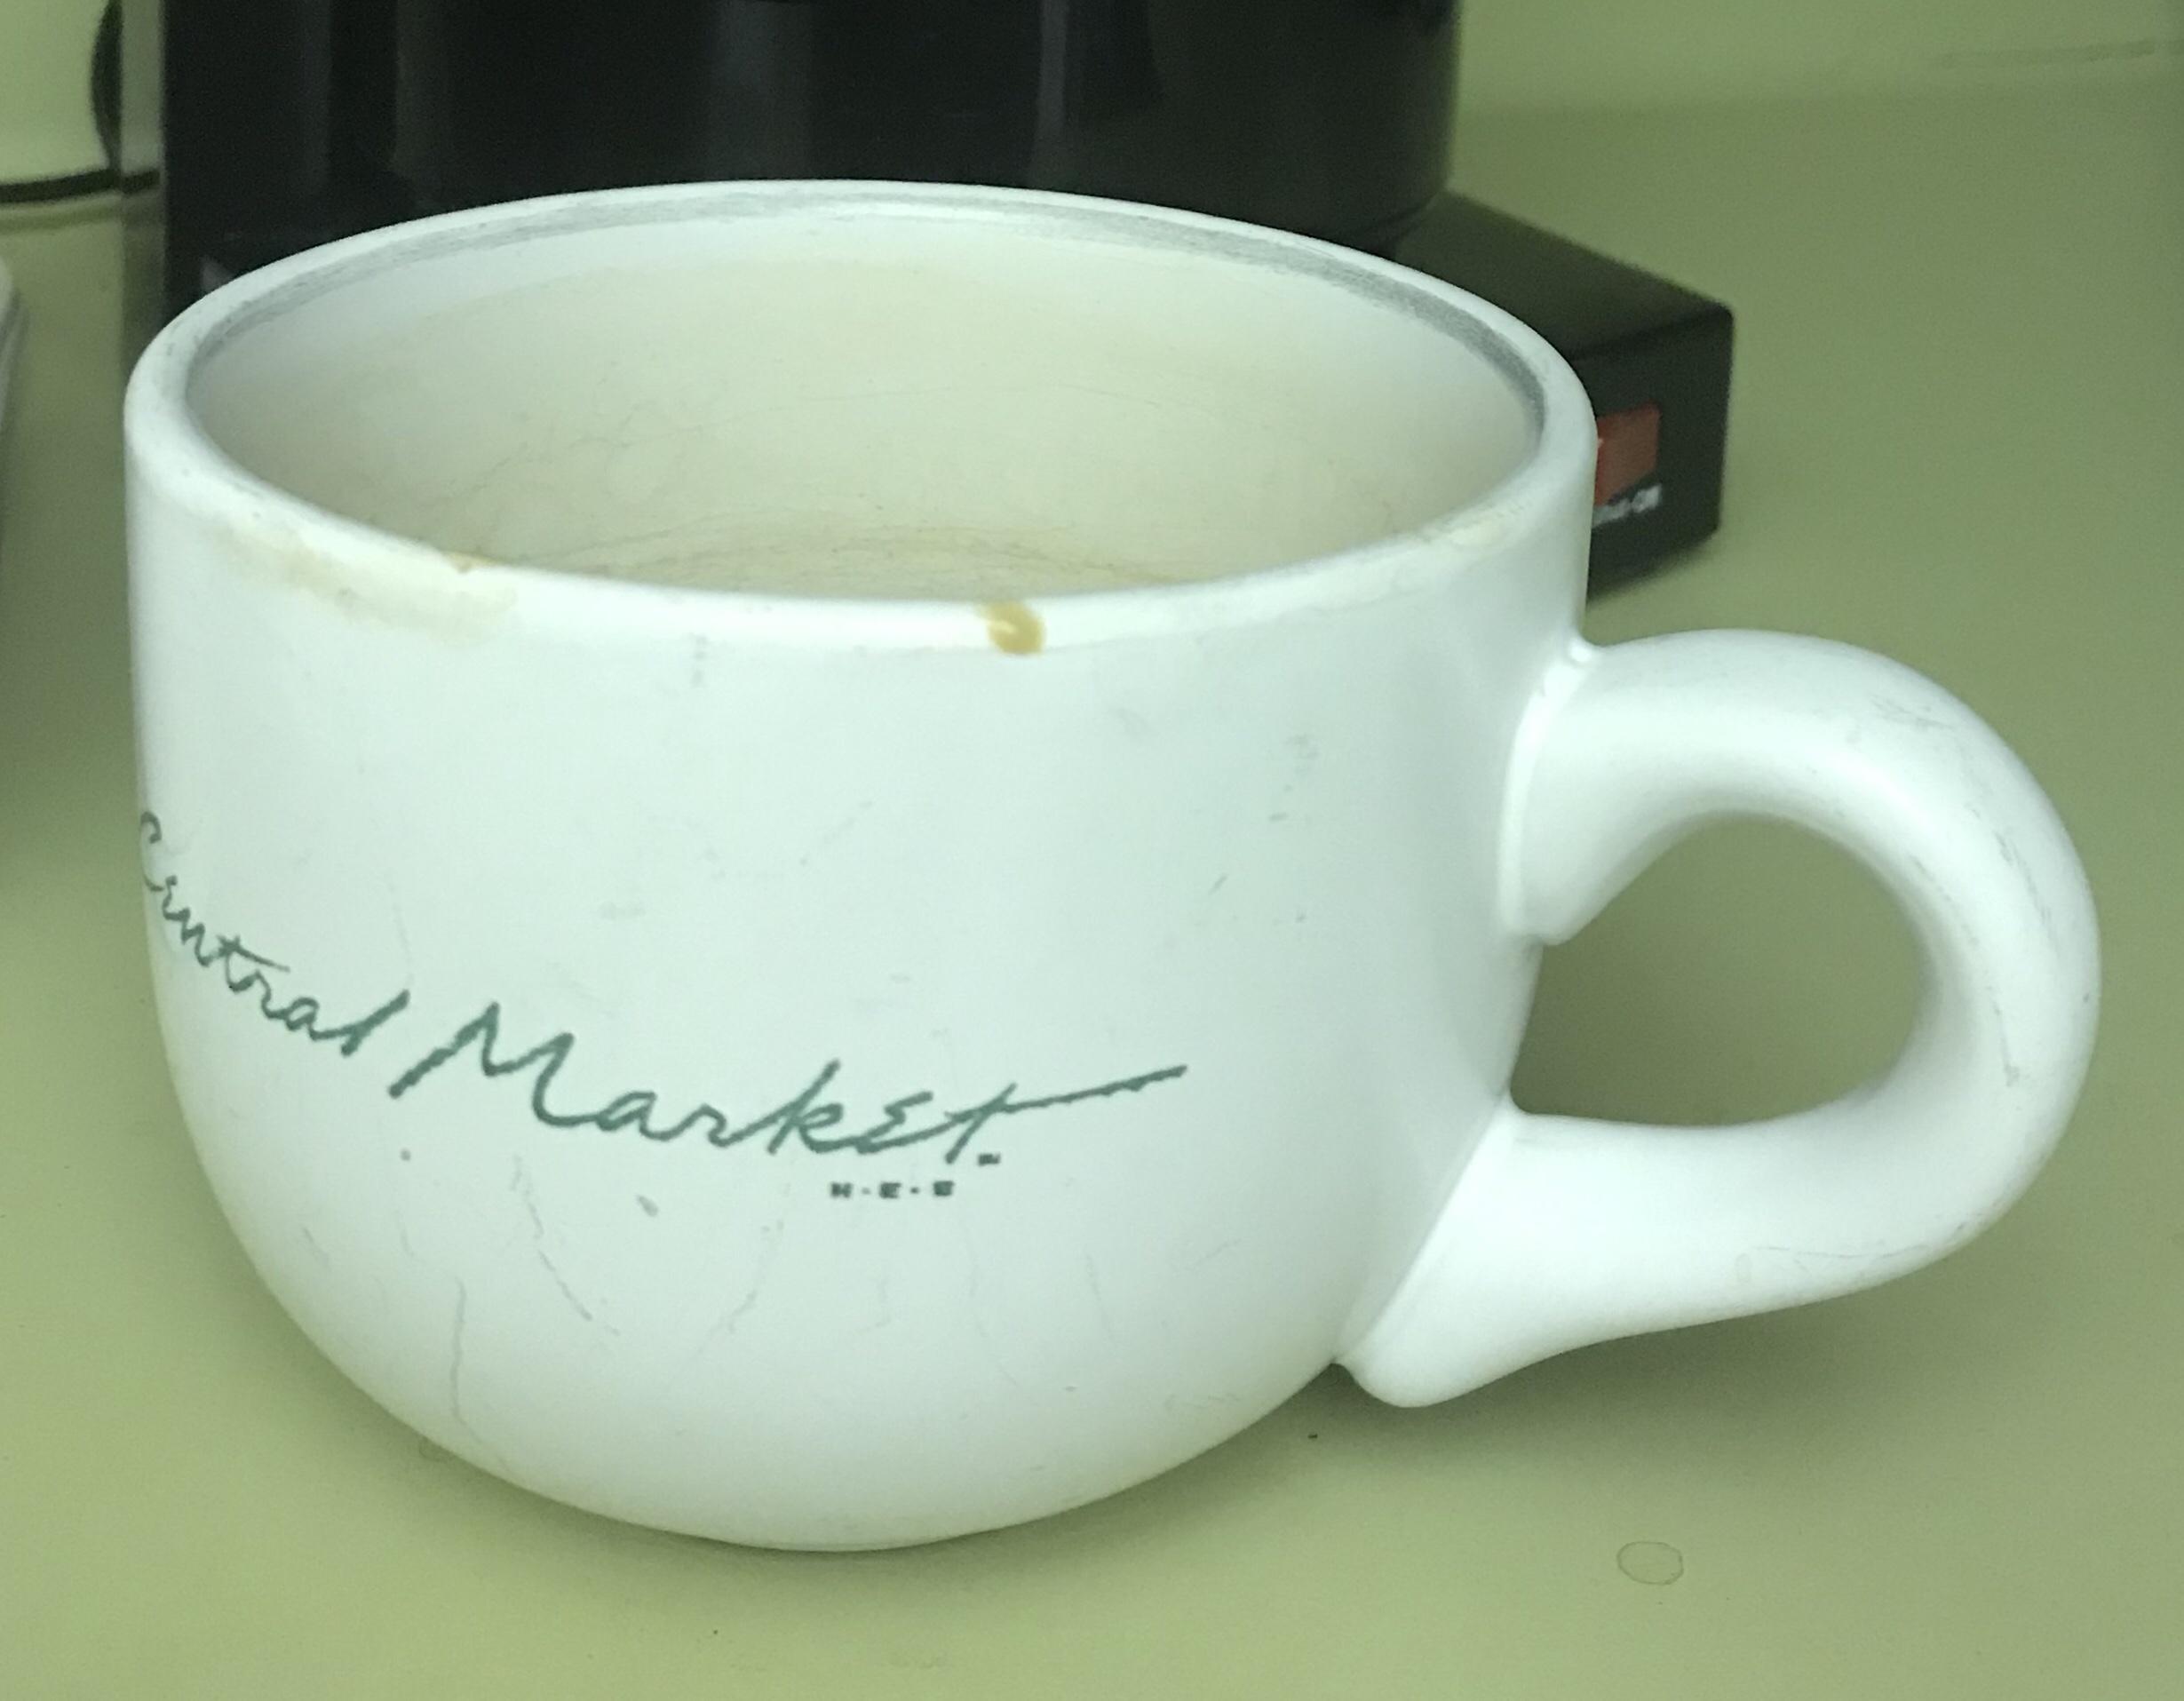 this is a coffee bowl: bigger than a mug, has a handle